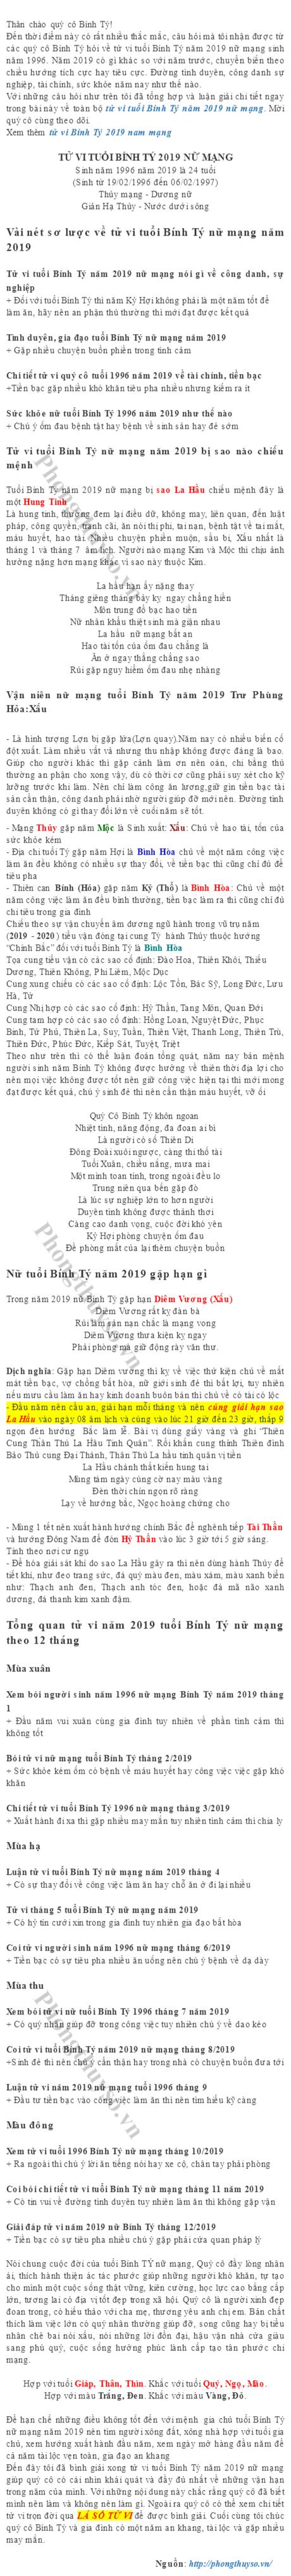 tu-vi-tuoi-binh-ty-nam-2019-nu-mang